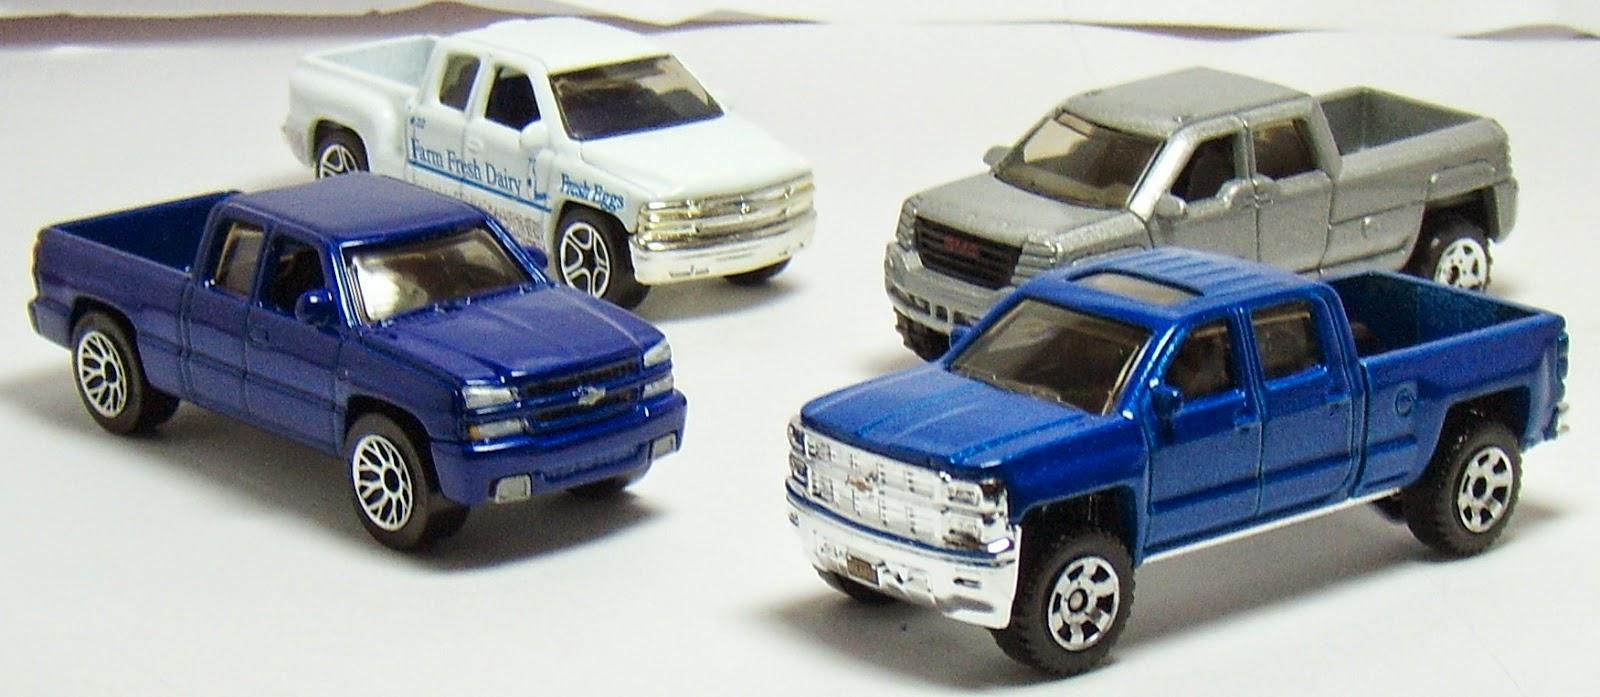 All Chevy chevy 2005 : Two Lane Desktop: Matchbox 2014, 2005, 1999 Chevy Silverado and ...